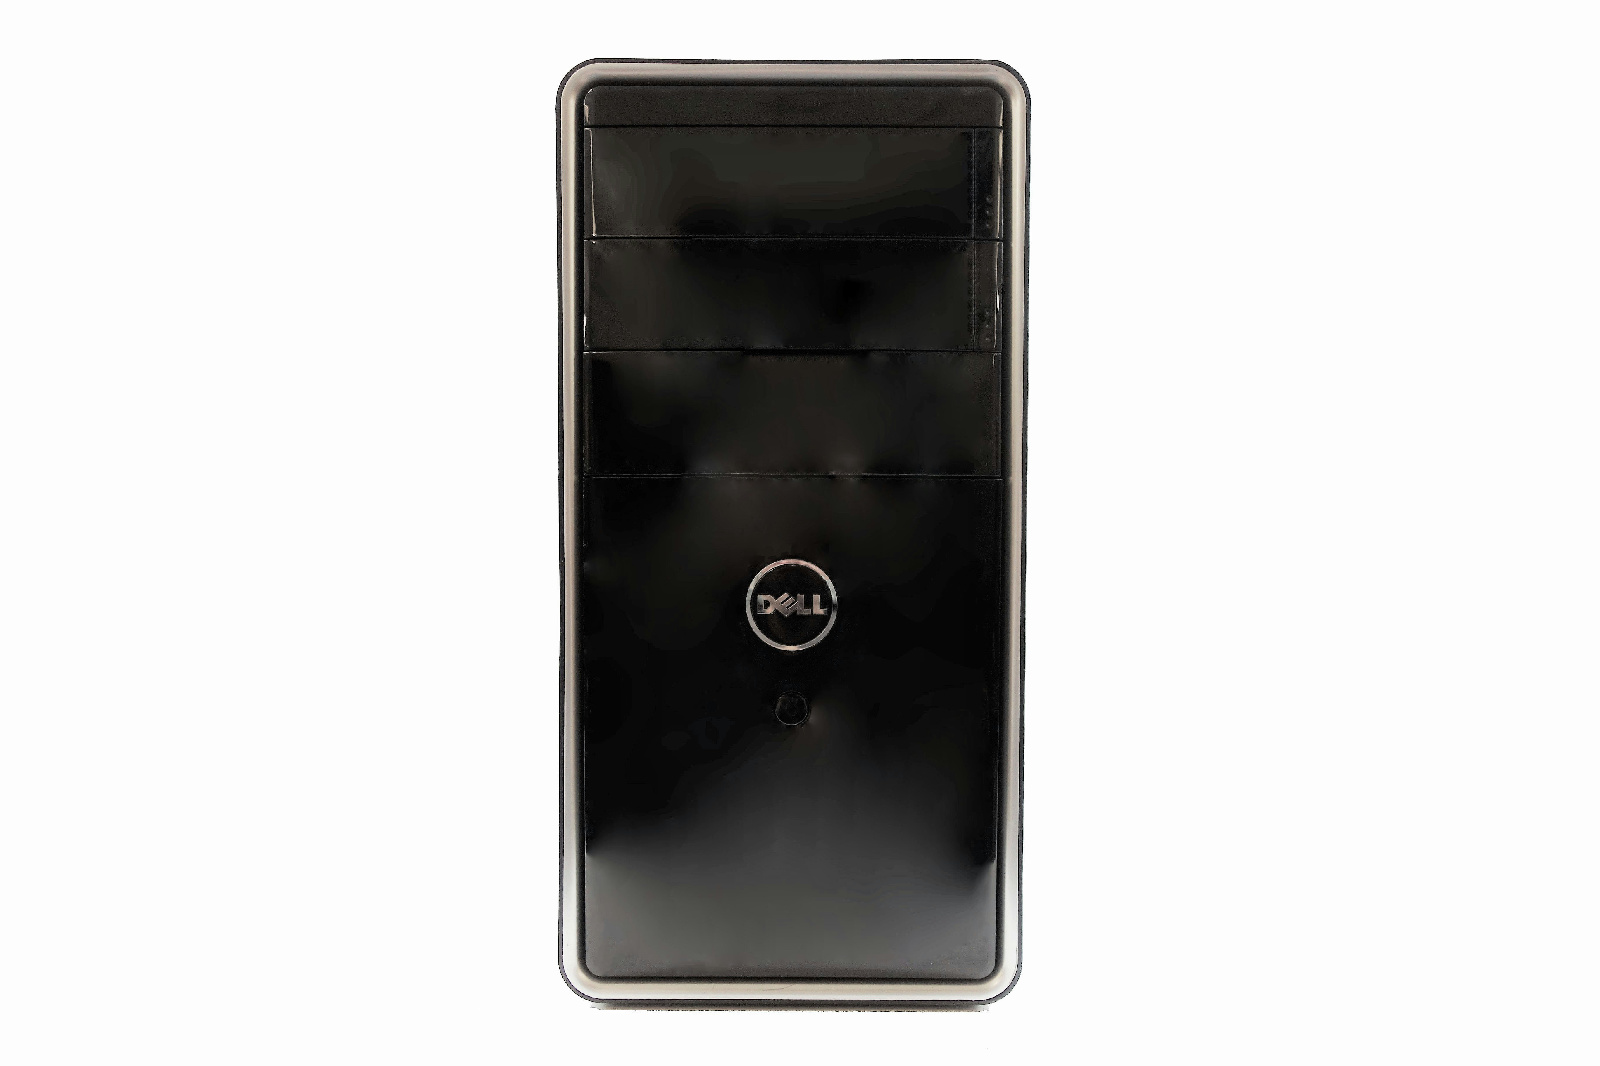 dell inspiron 620 mini tower intel core i3 2100 4gb ram 250gb hdd ebay. Black Bedroom Furniture Sets. Home Design Ideas